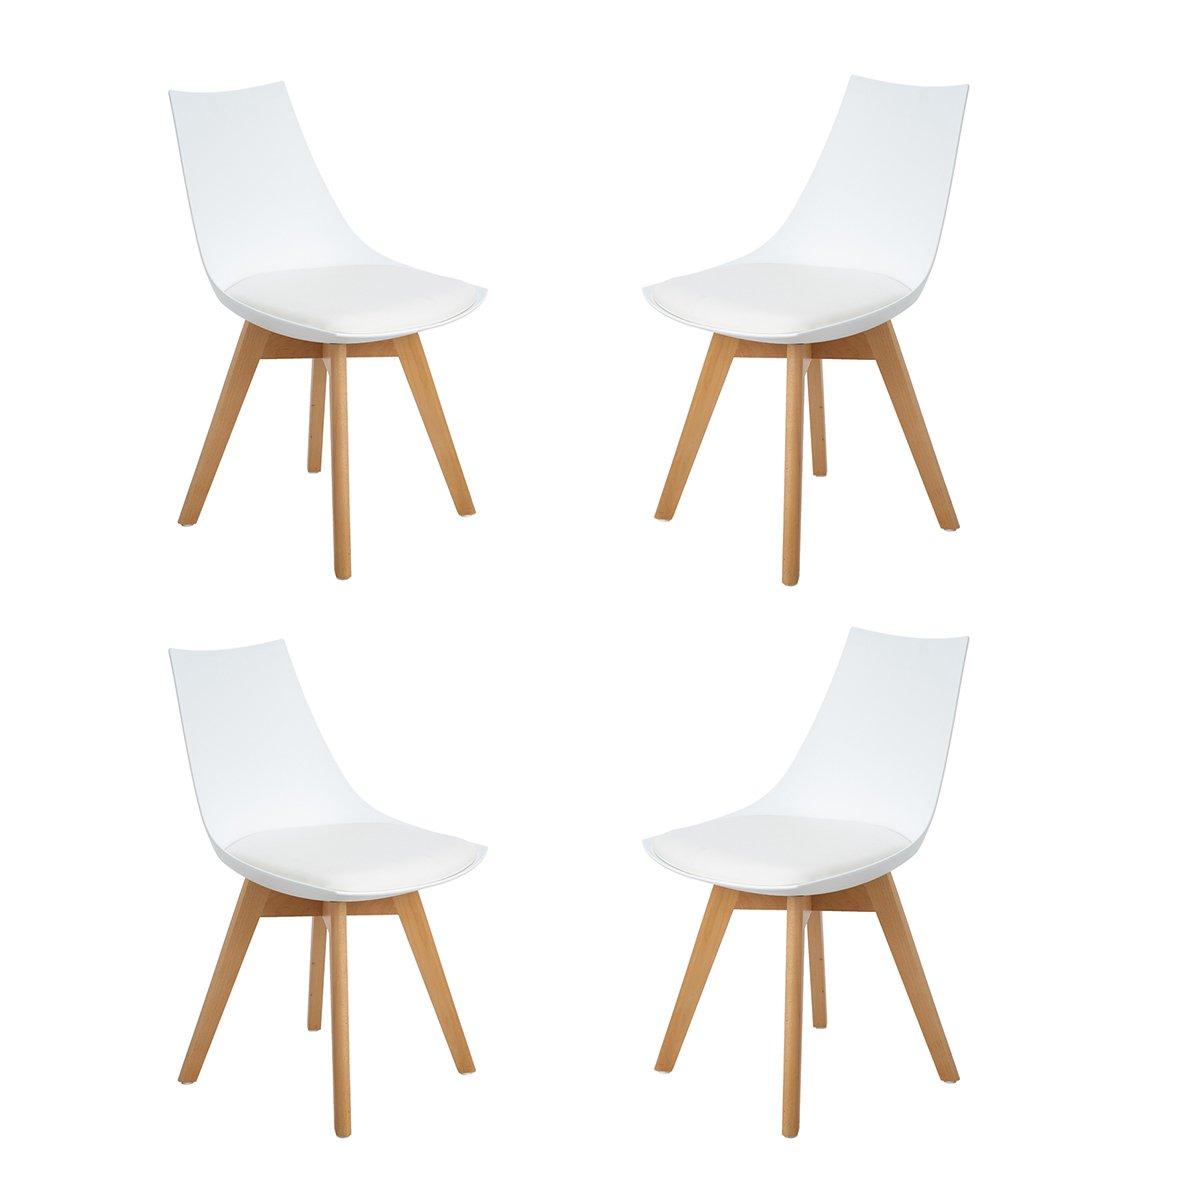 H.J WeDoo 4er Set Retro Design Stuhl Esszimmerstühle Wohnzimmerstühl Wohnzimmerstühl Wohnzimmerstühl mit Bequem Gepolstertem Sitz, Weiß 68c9c0